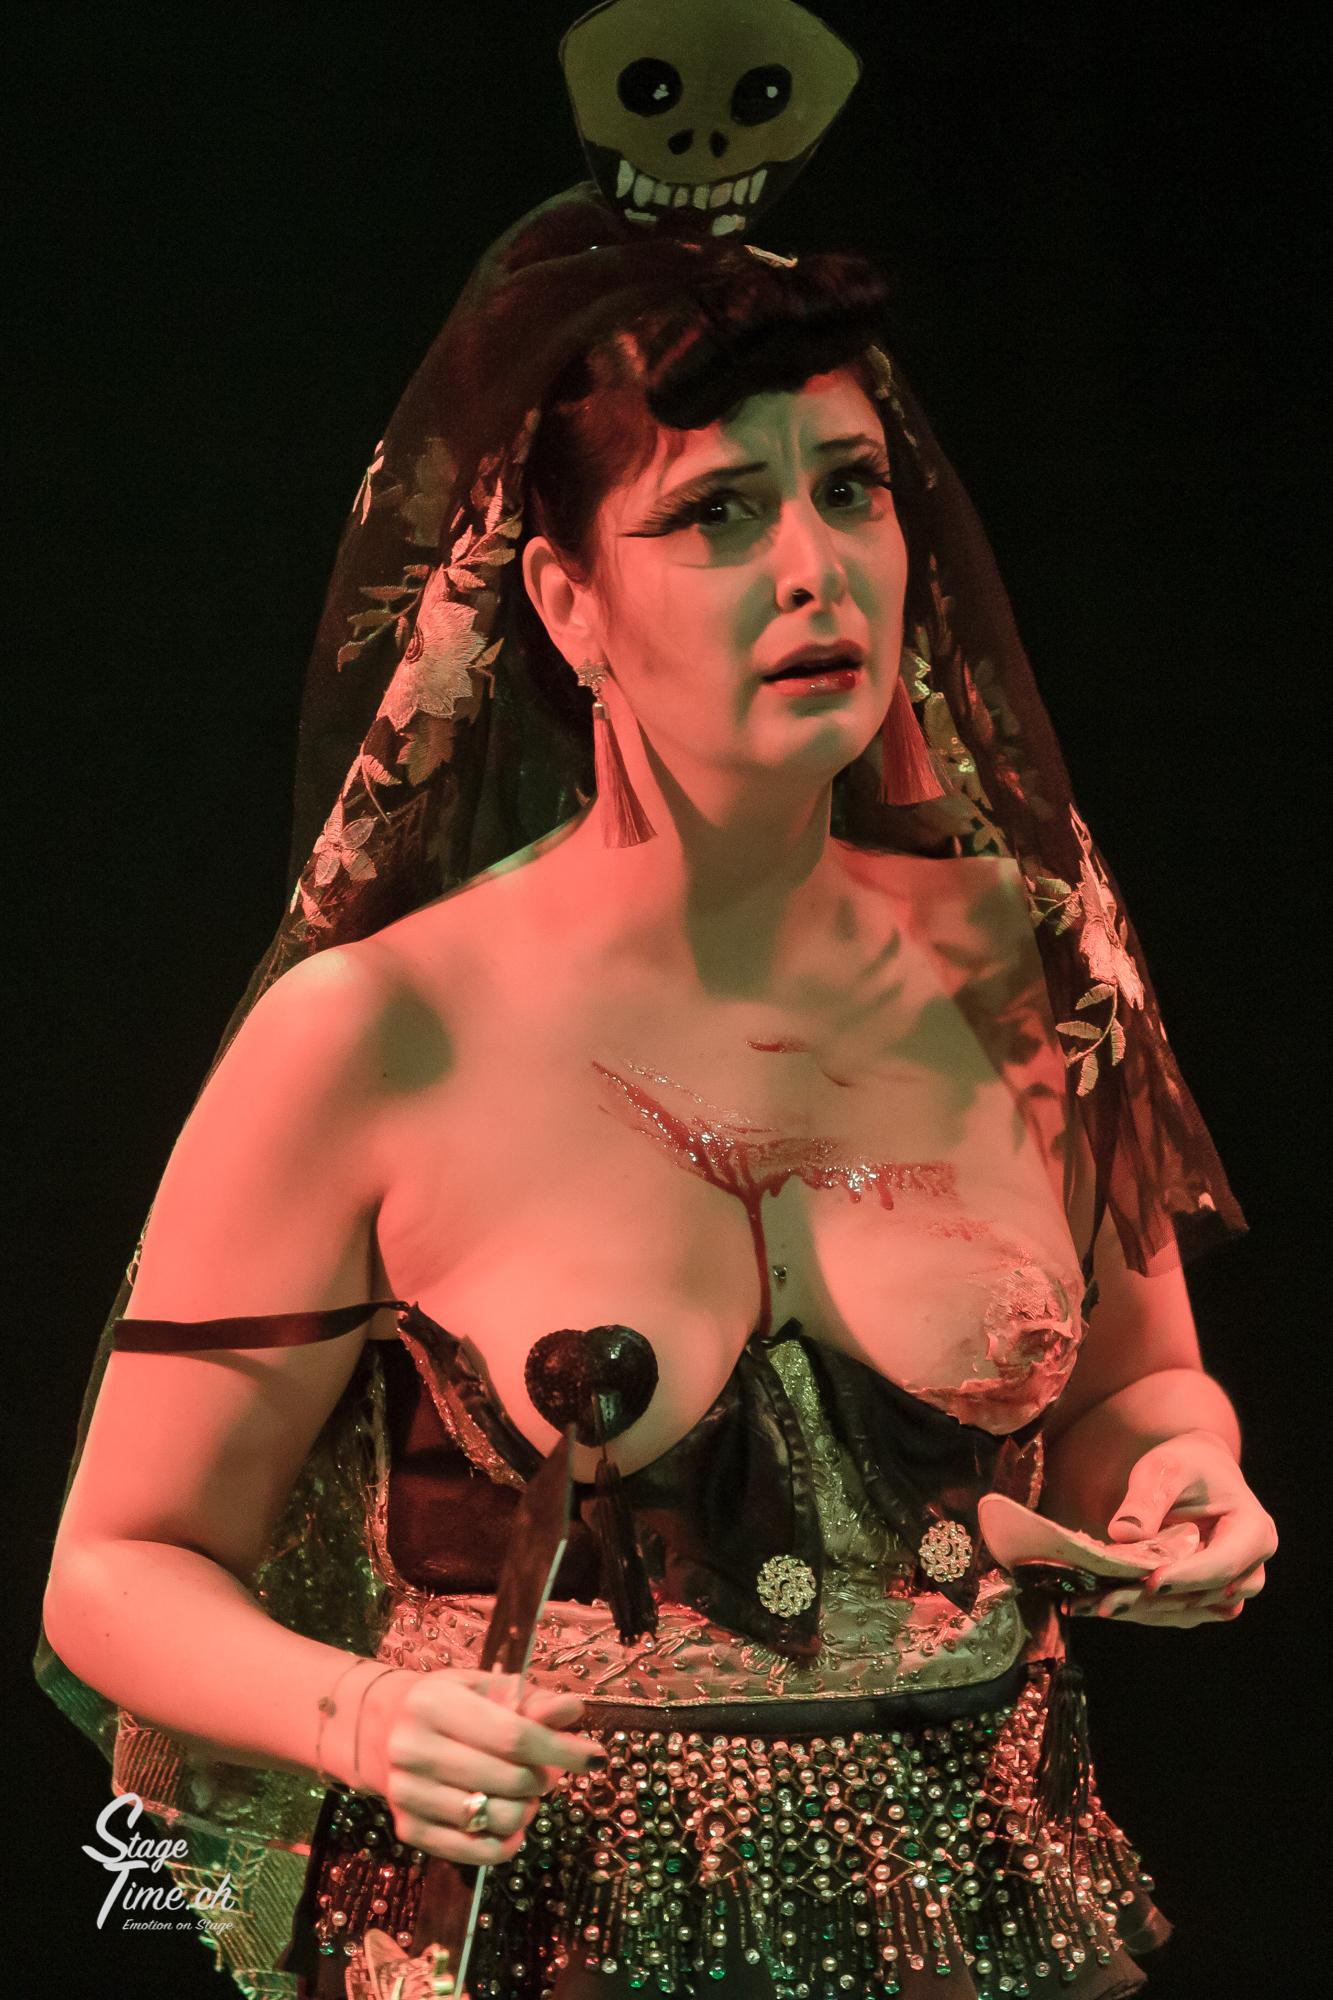 Miss_Harley_Queen___Burlesque_Show_au__C